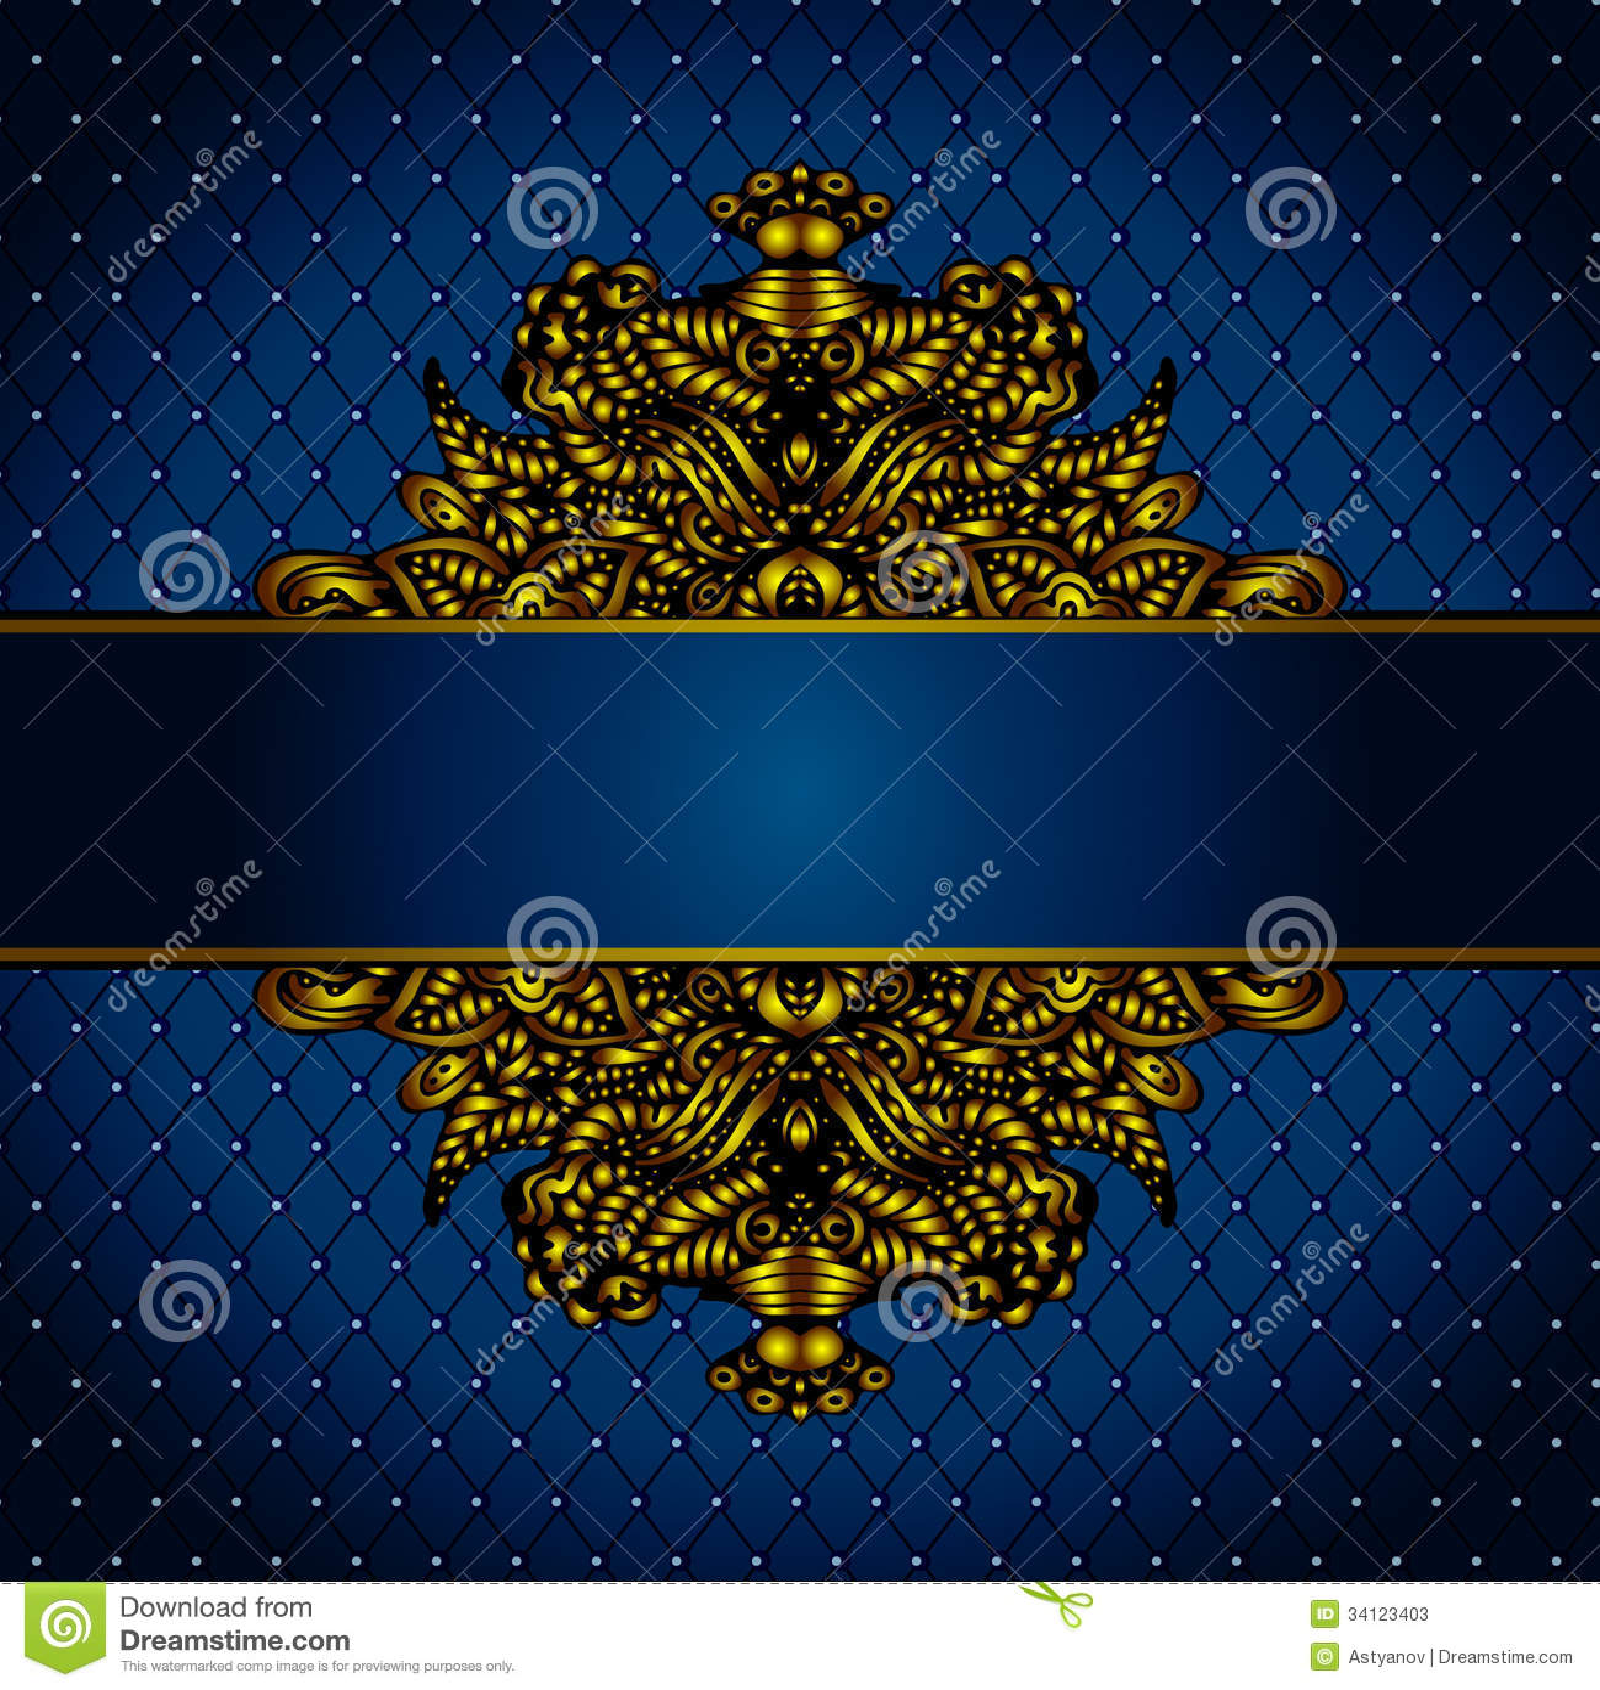 Royal Invitations was amazing invitation layout